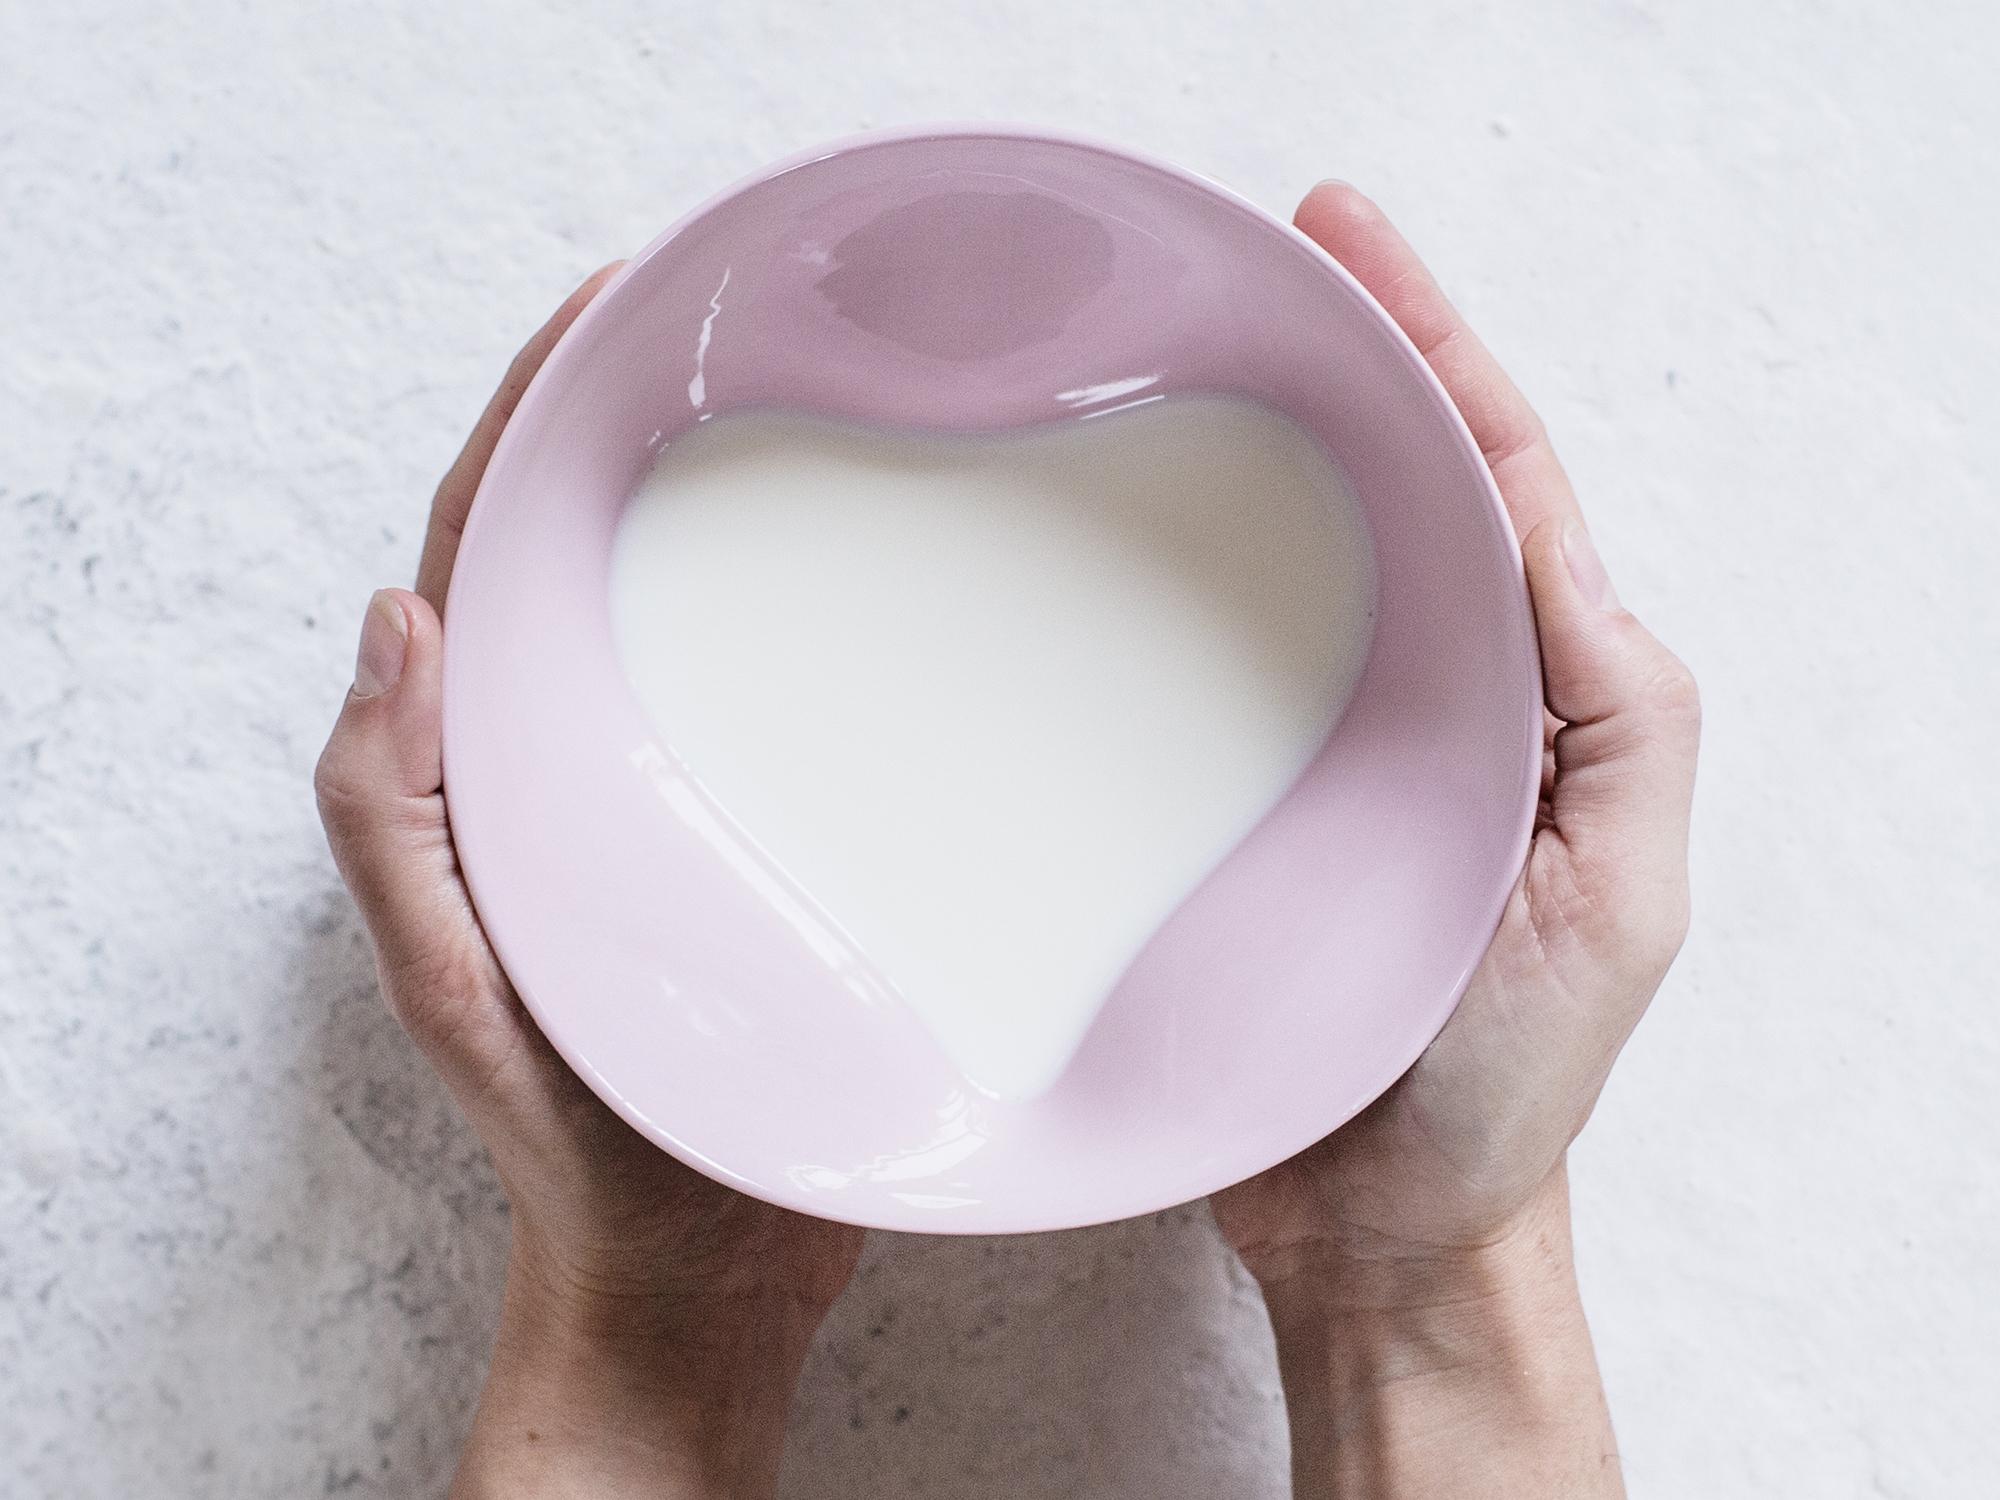 TABLO_SRDCE-pink_image1-detail